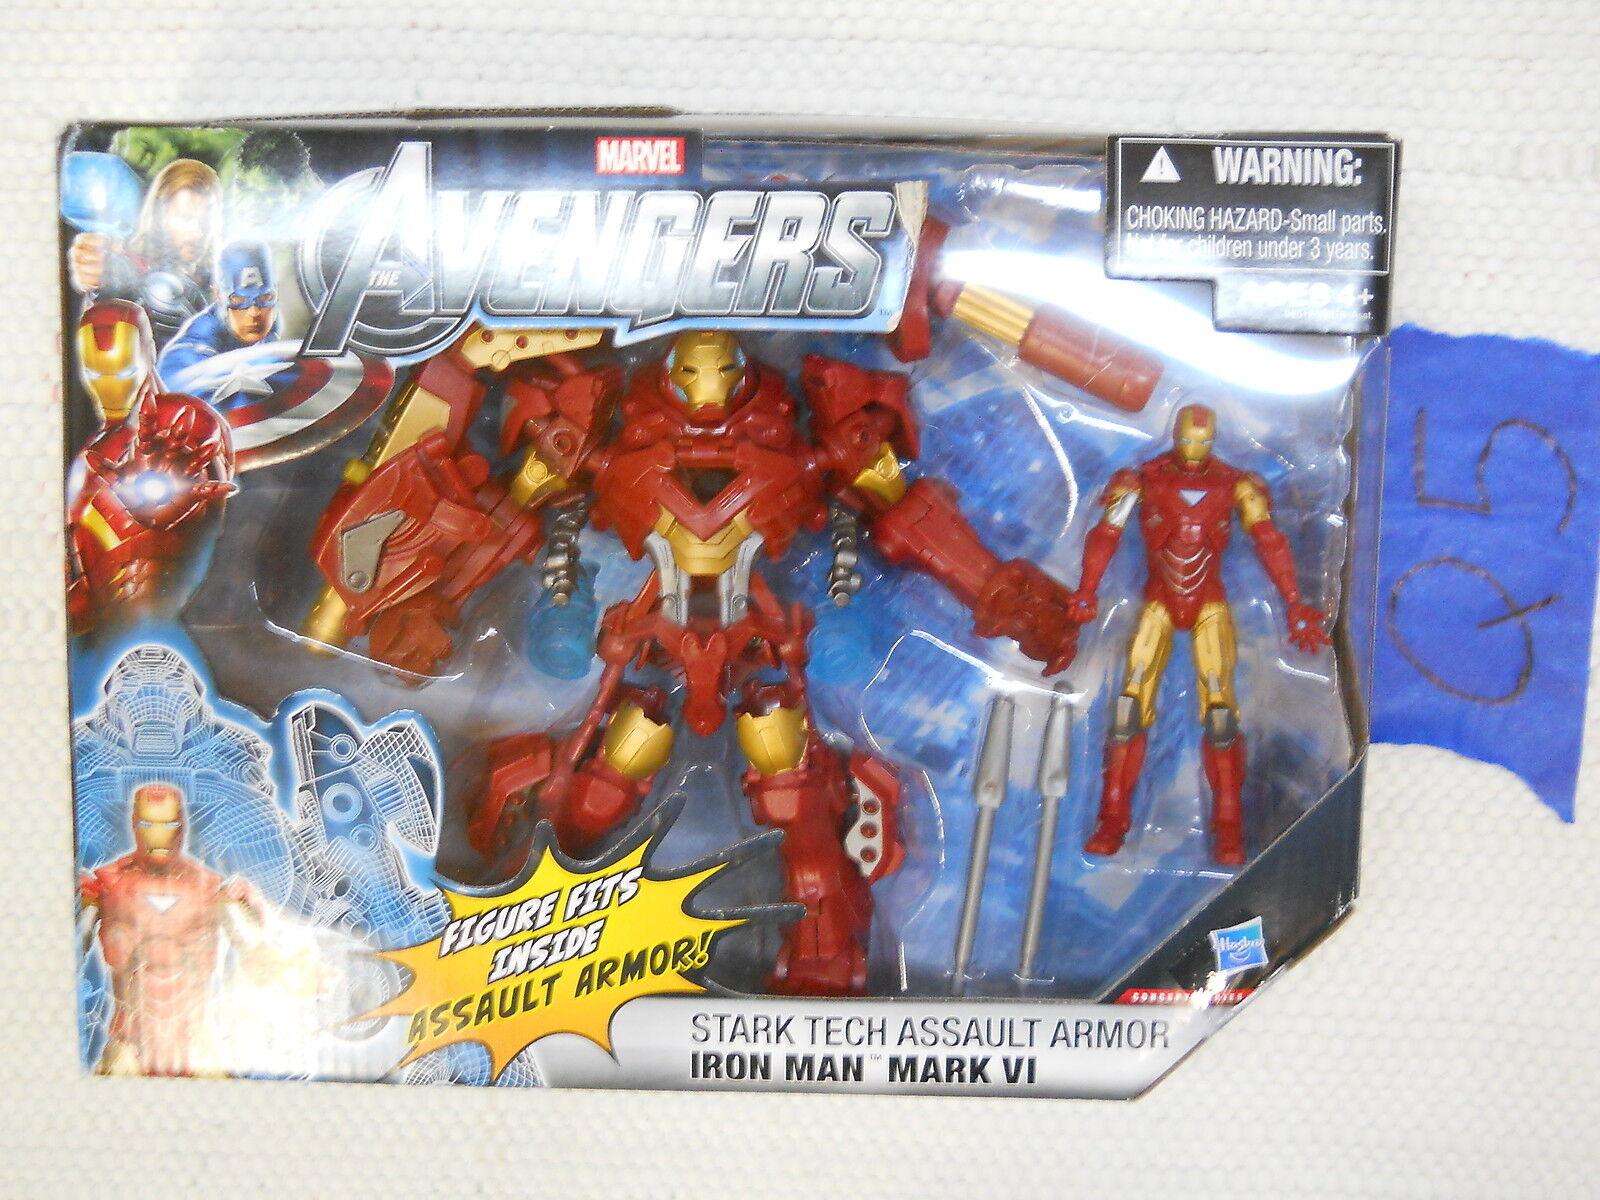 Q51 Hasbro Marvel Universe Lot AVENGER IRON uomo MARK VI estrellaK TECH ASSAULT ARMOR